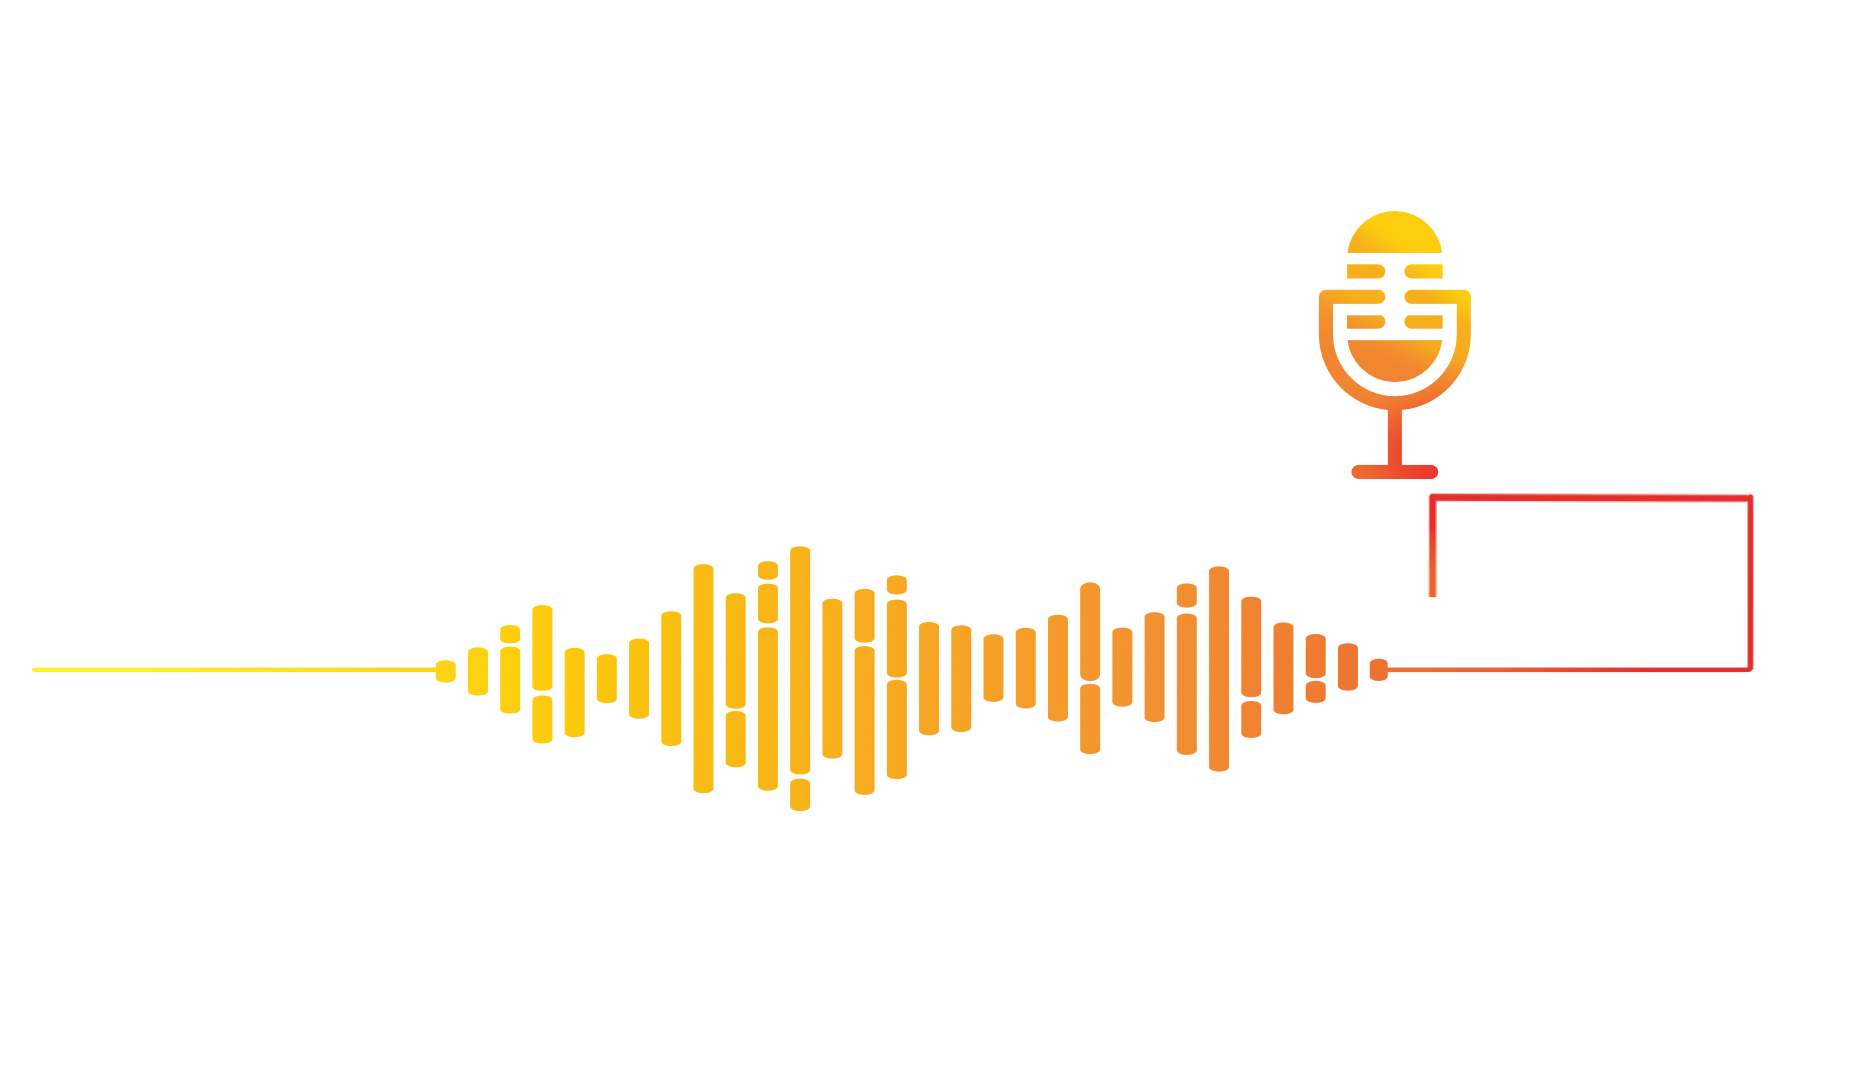 warm-up live